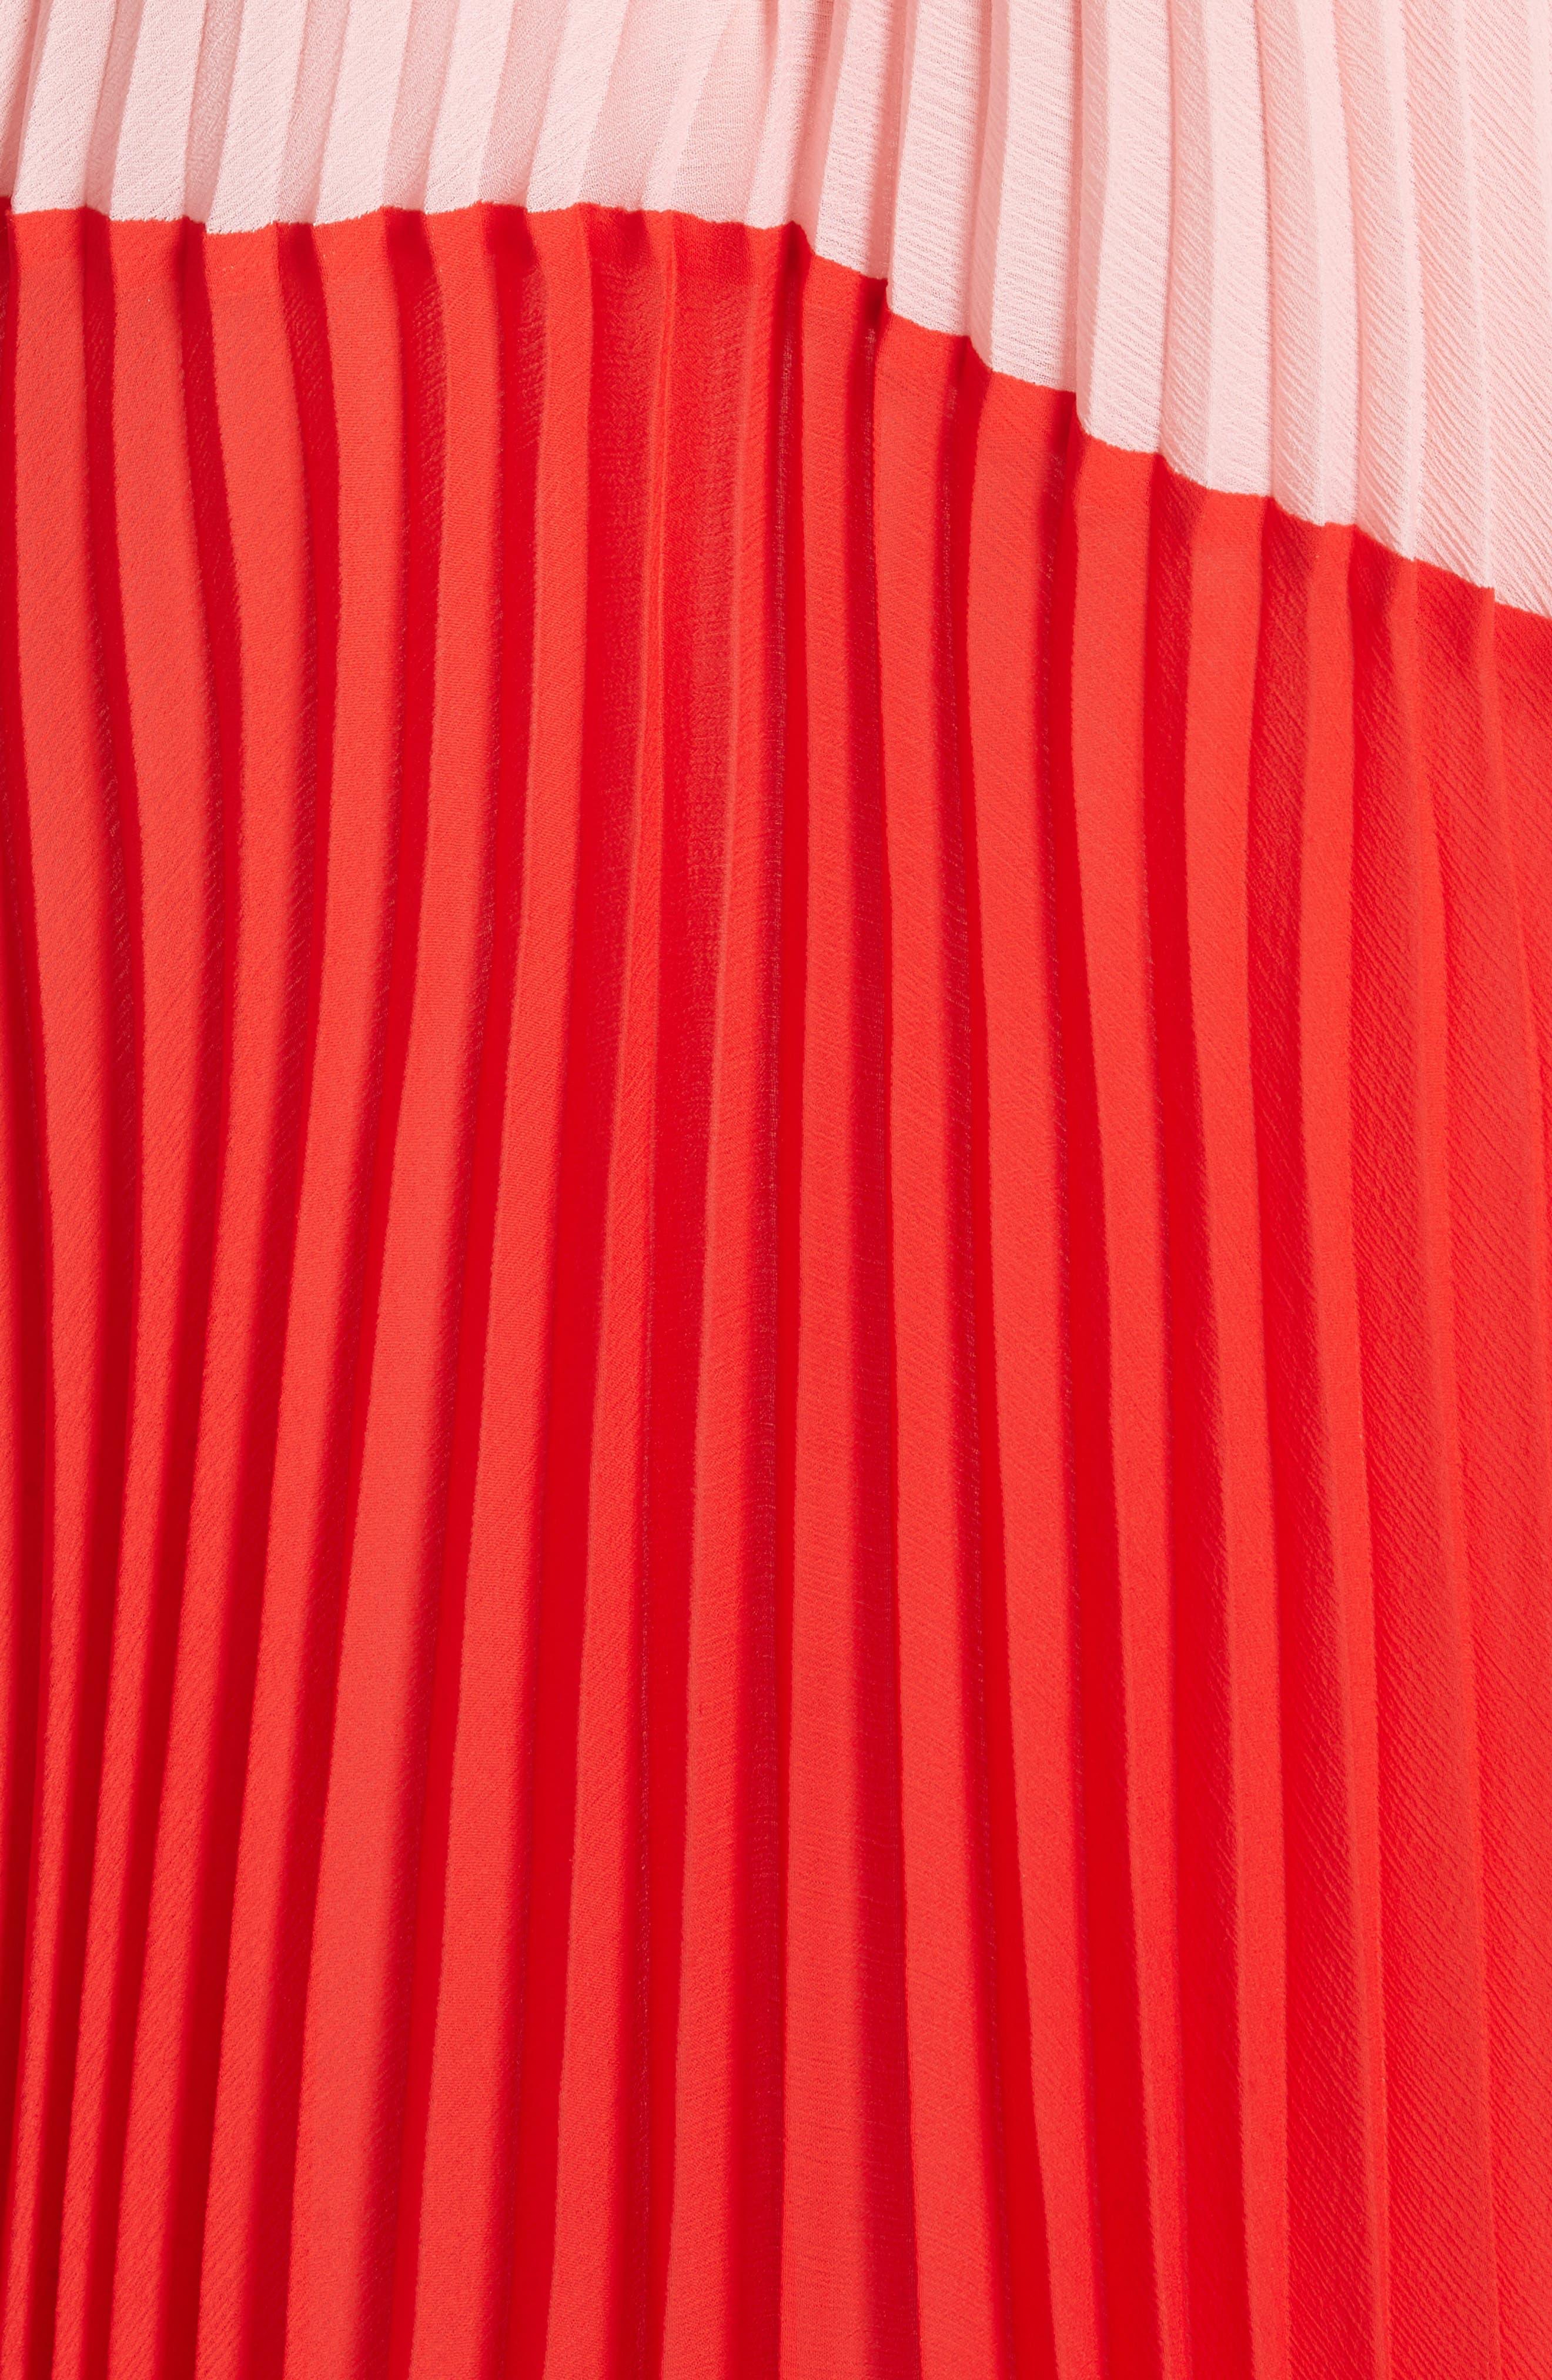 Rozlyn Pleat Colorblock Maxi Dress,                             Alternate thumbnail 5, color,                             Perfect Poppy/ Blossom